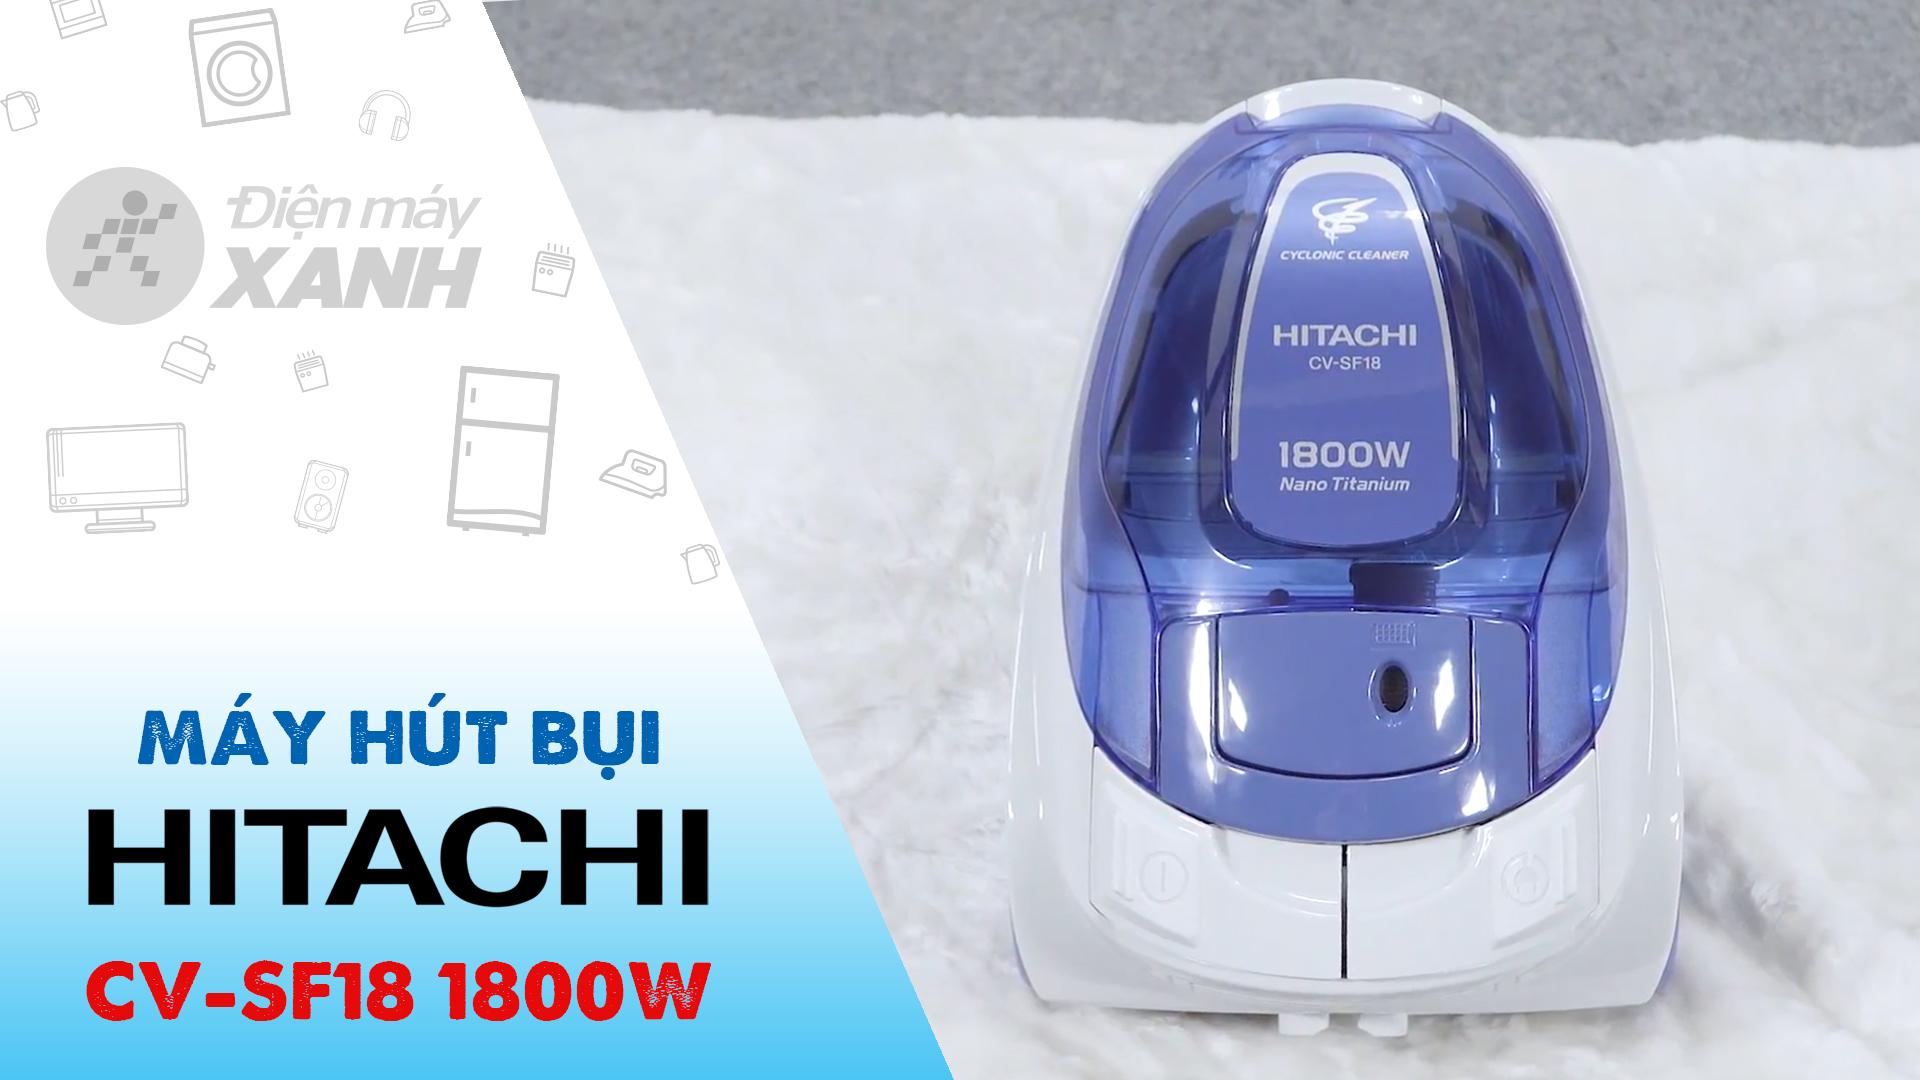 Máy hút bụi Hitachi CV-SF18 1800W